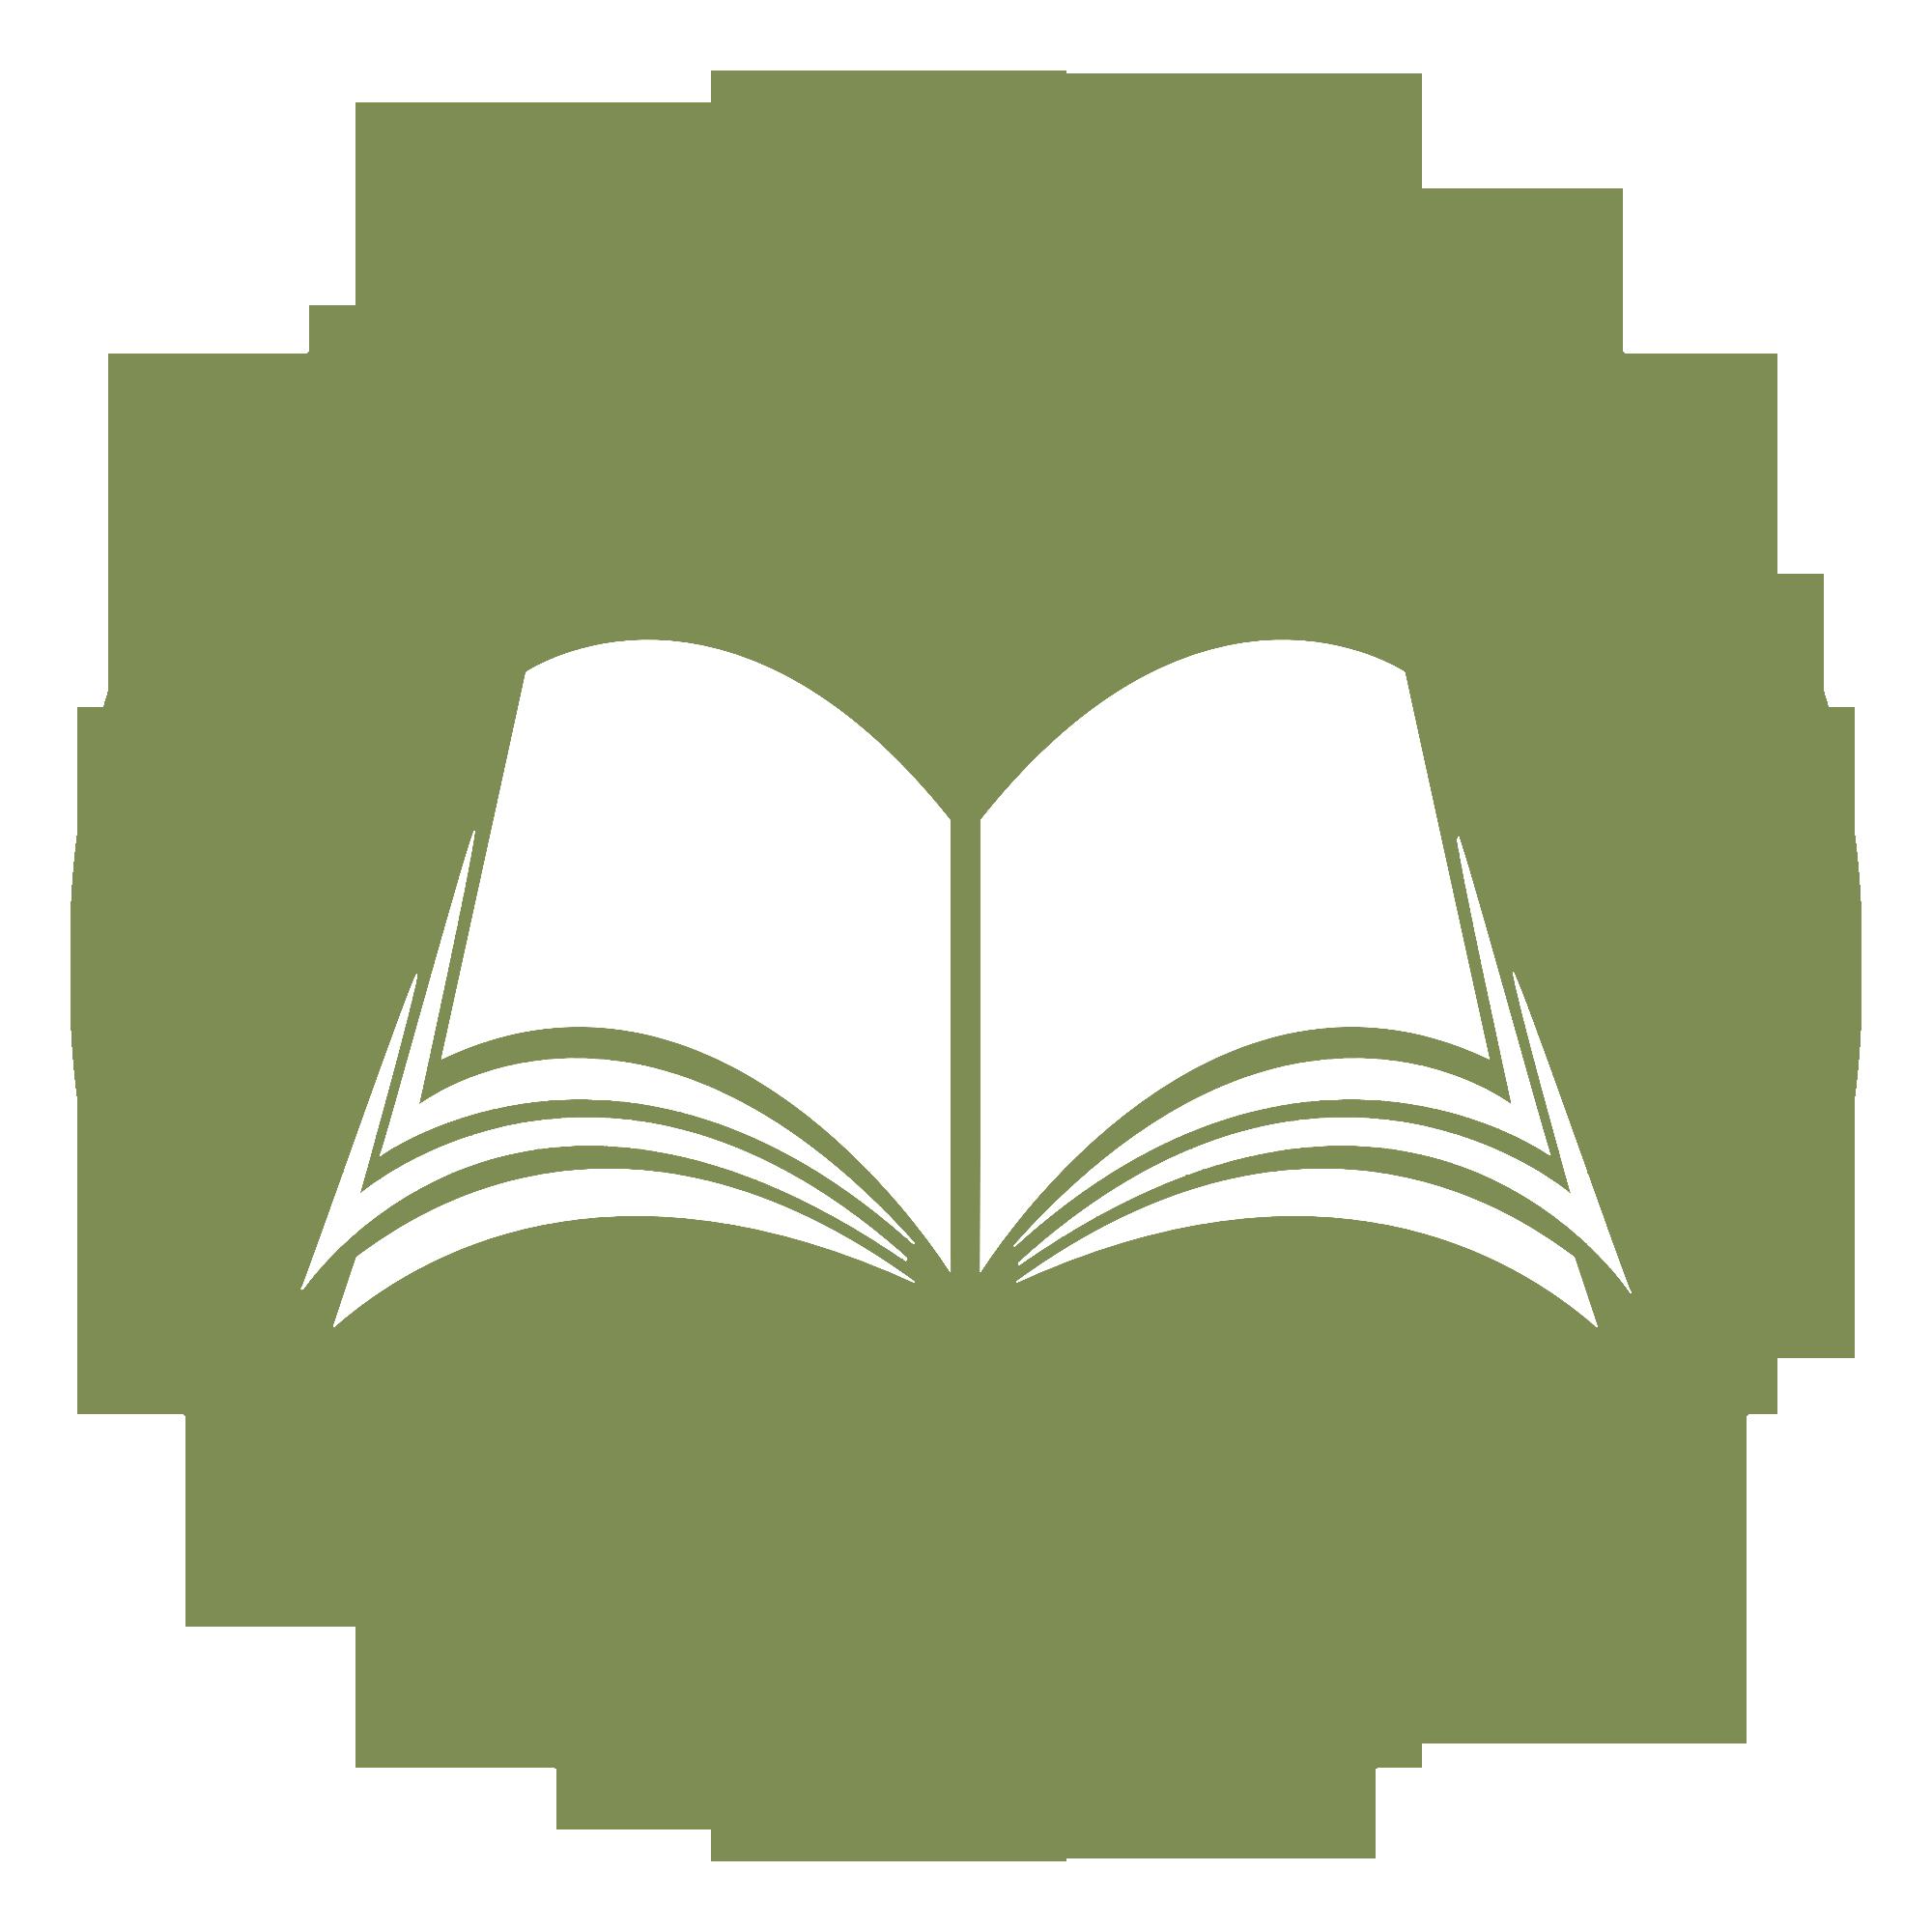 SUB_ICON-EDUCATION_1.png